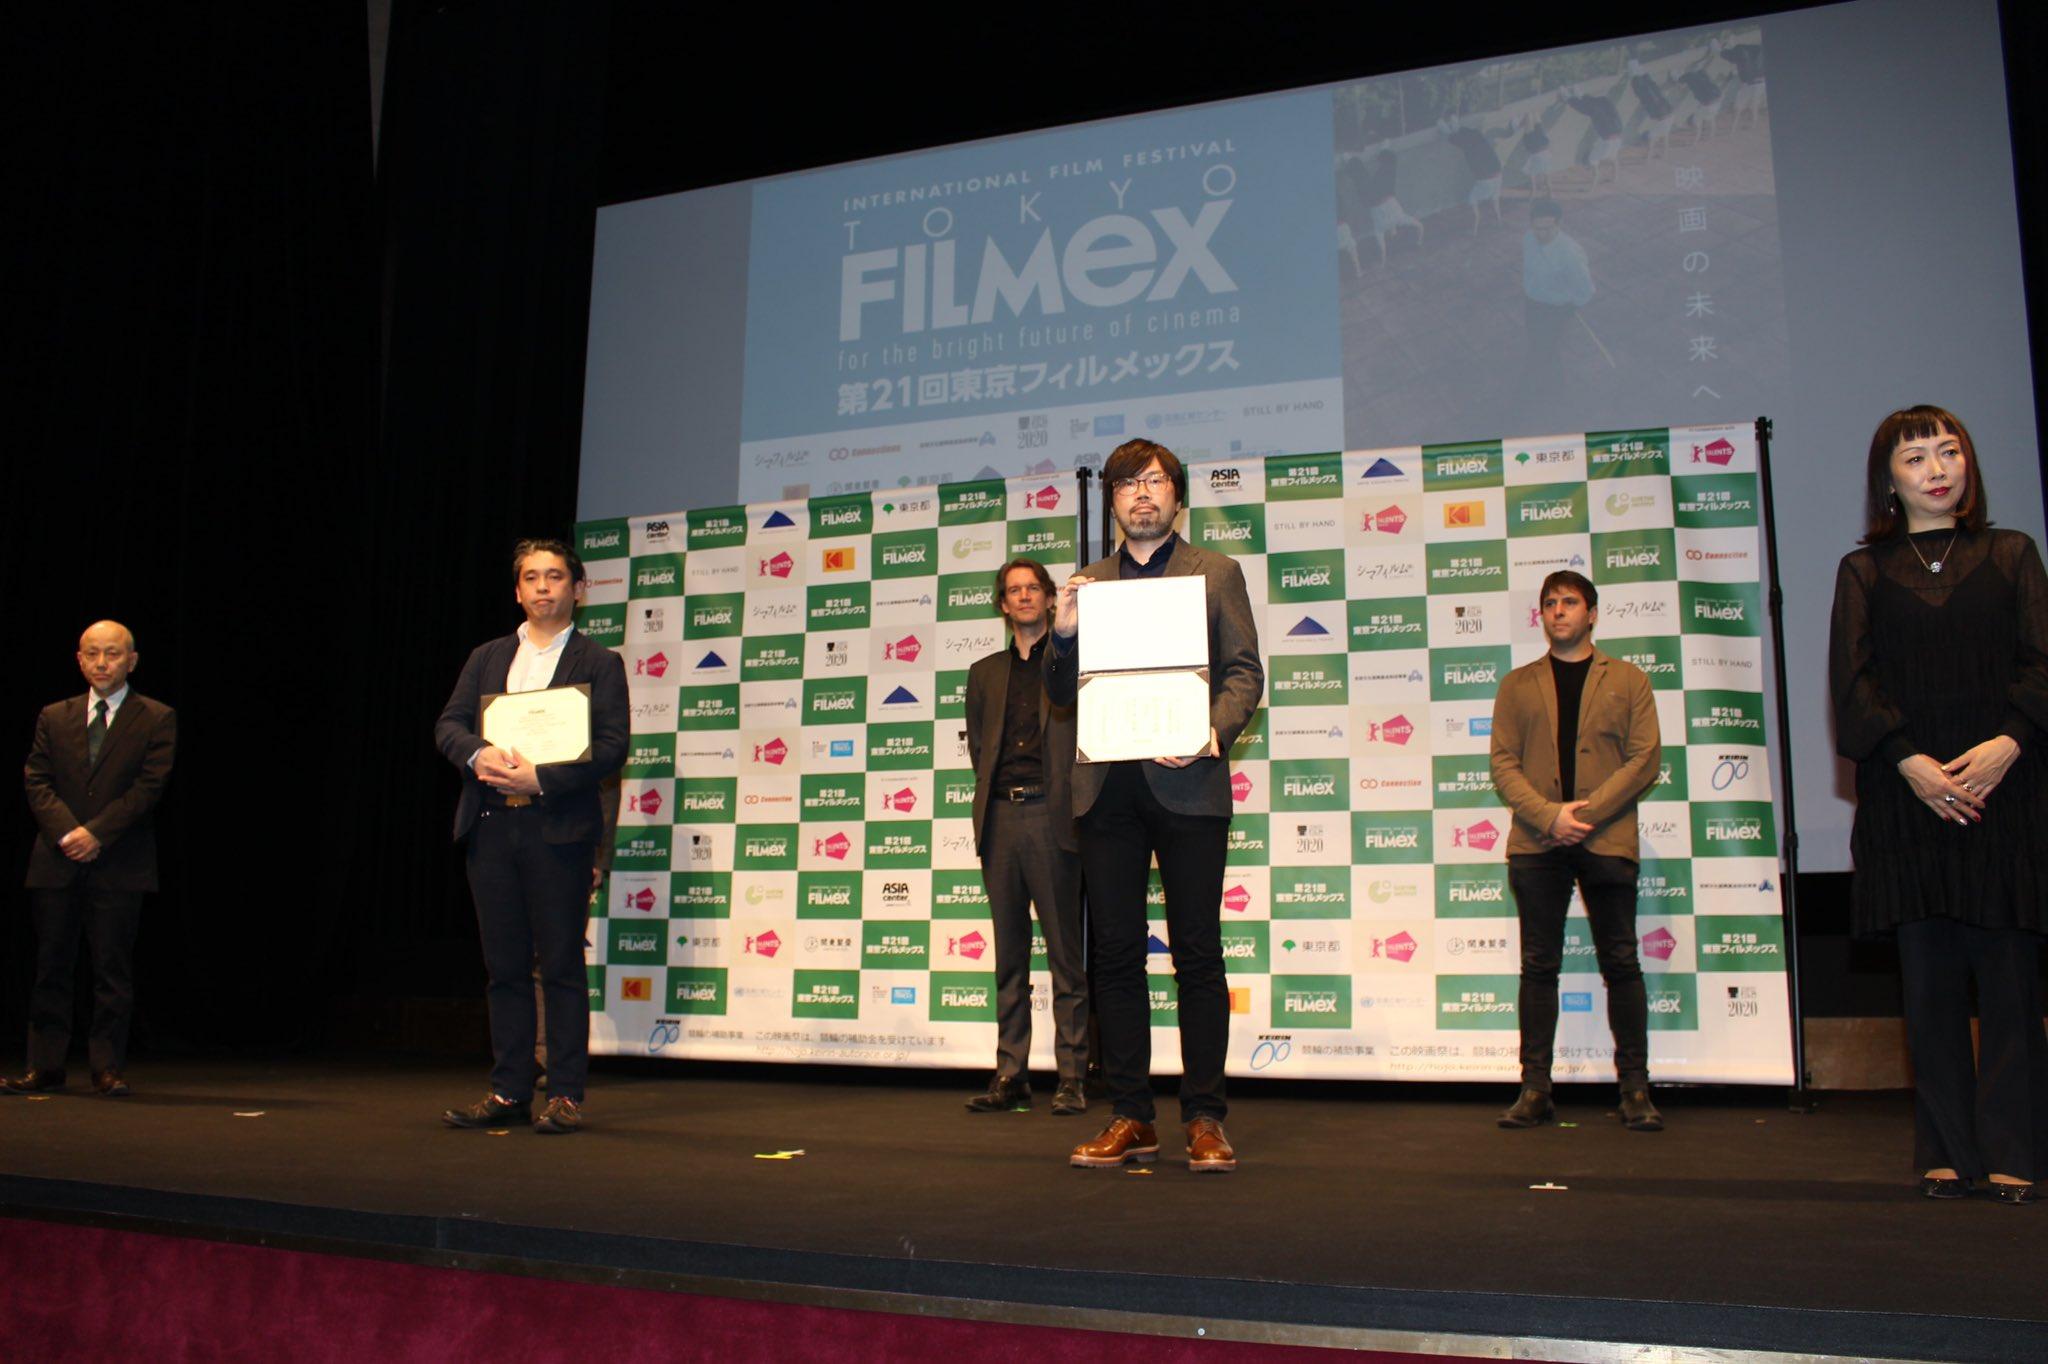 Palmarés japonés 21 Tokyo Filmex